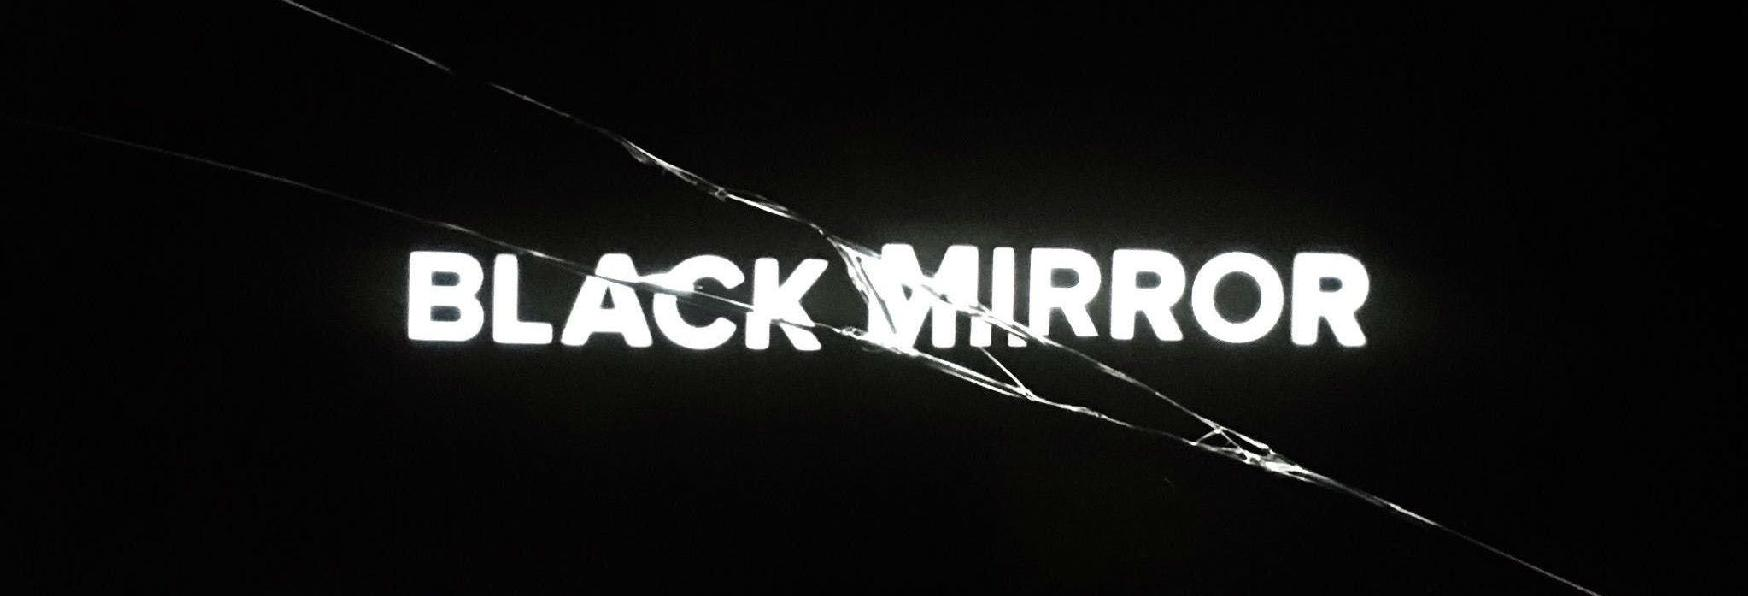 Black Mirror: Bandersnatch sarà un Film Interattivo di Netflix?